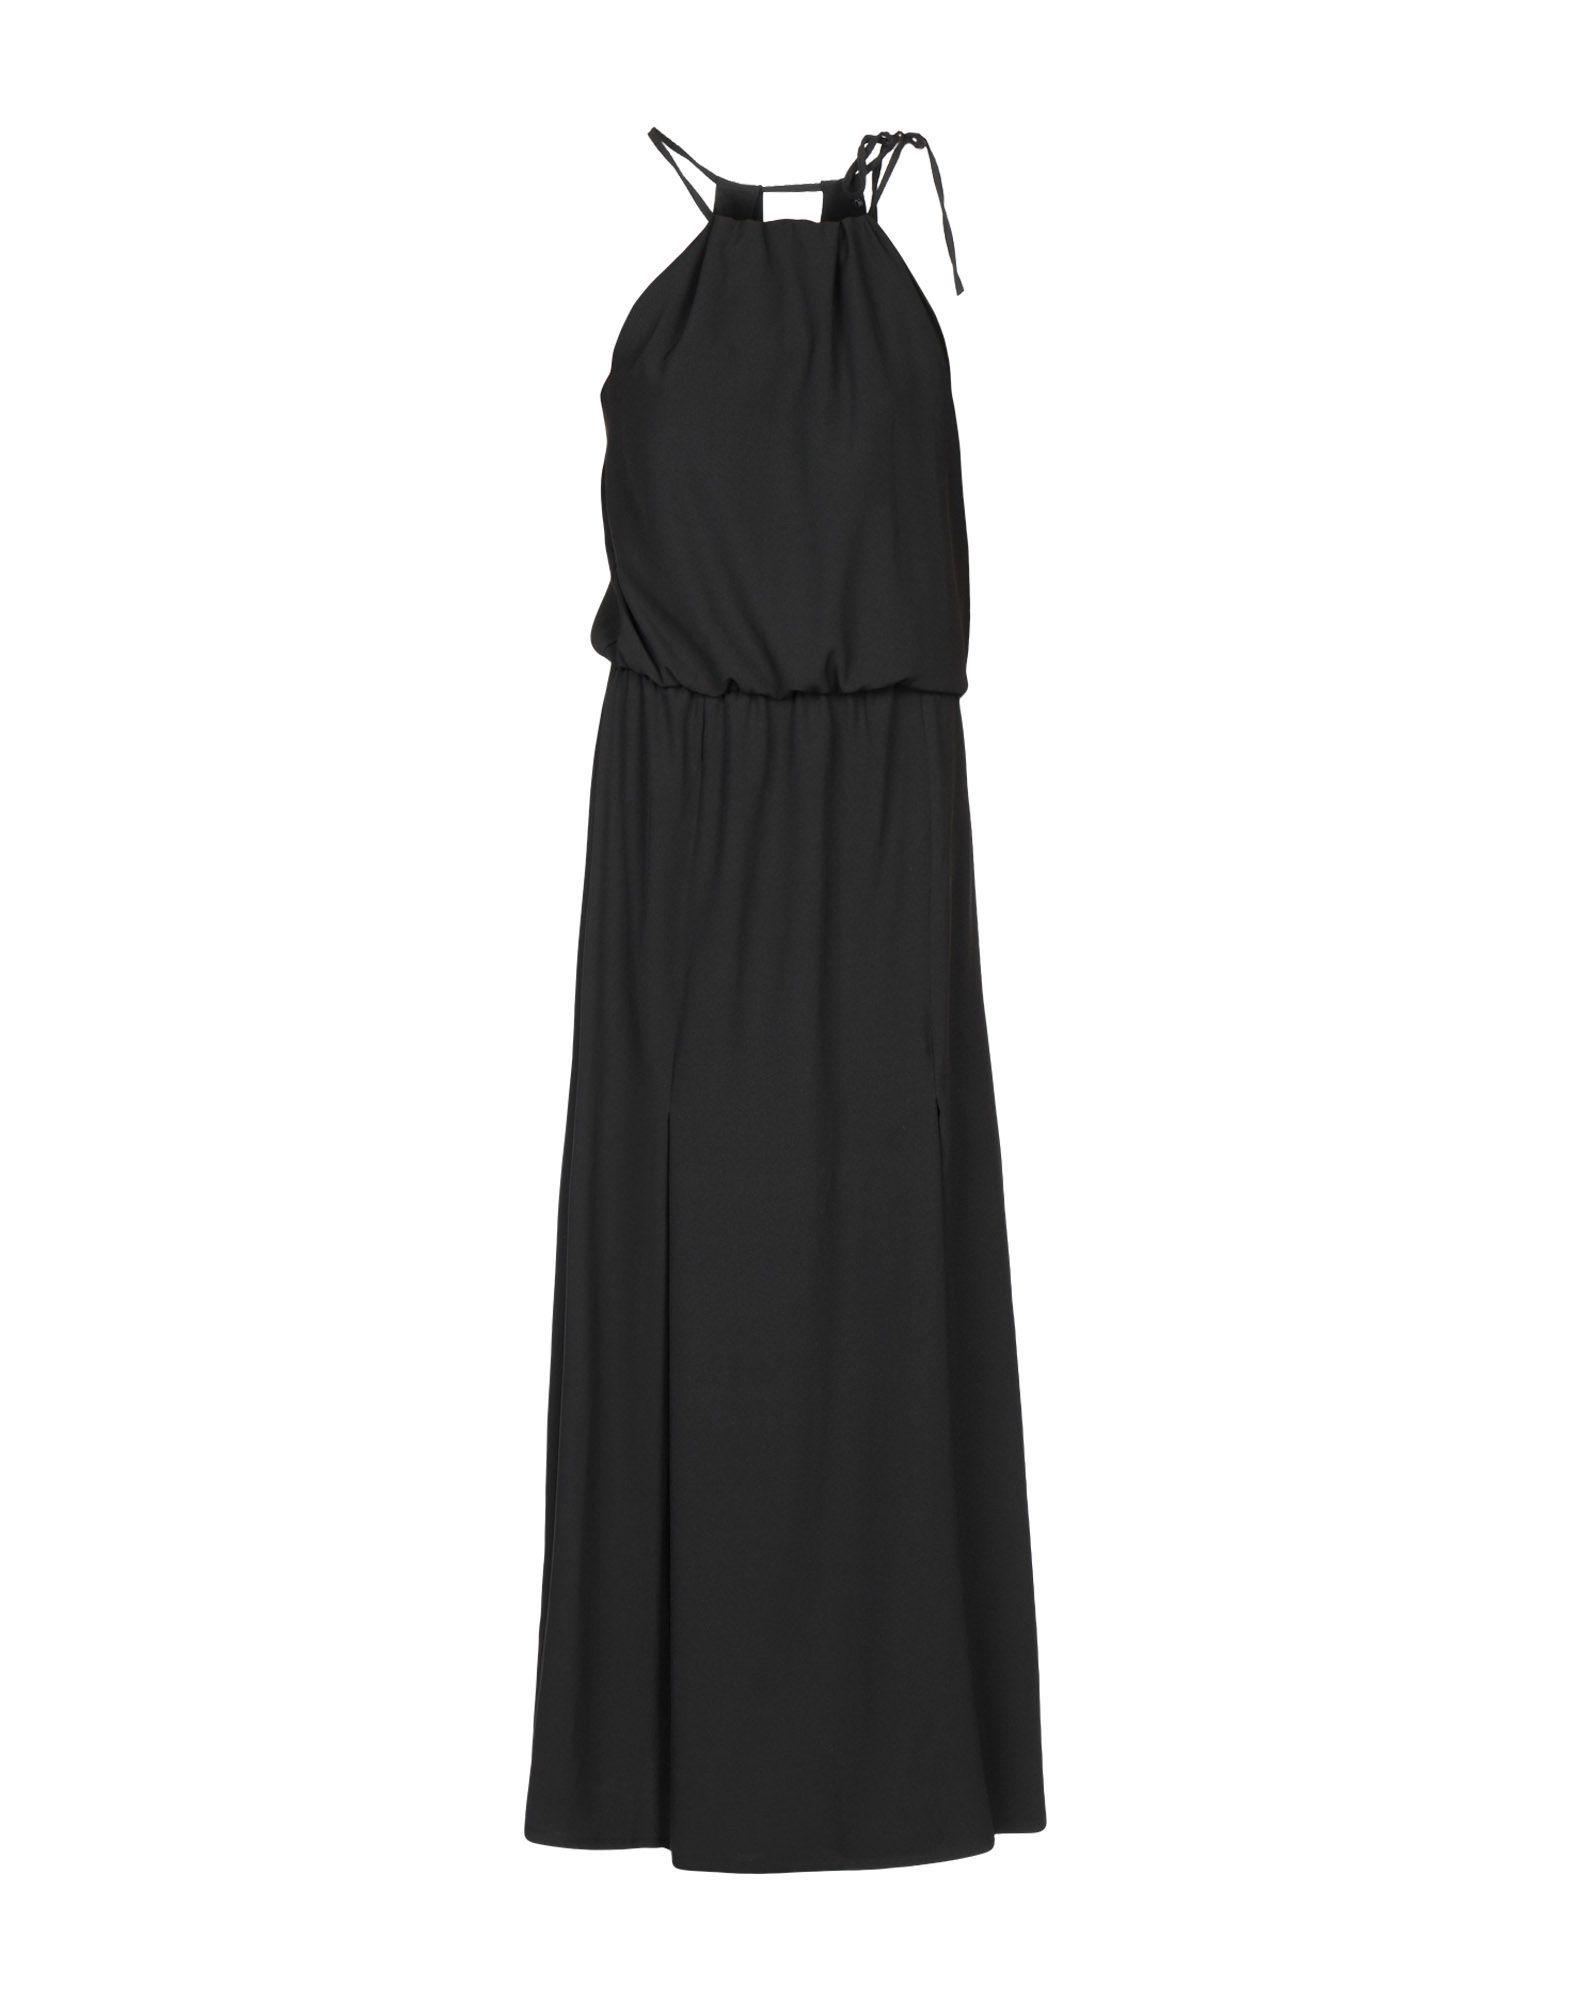 FLY GIRL Длинное платье